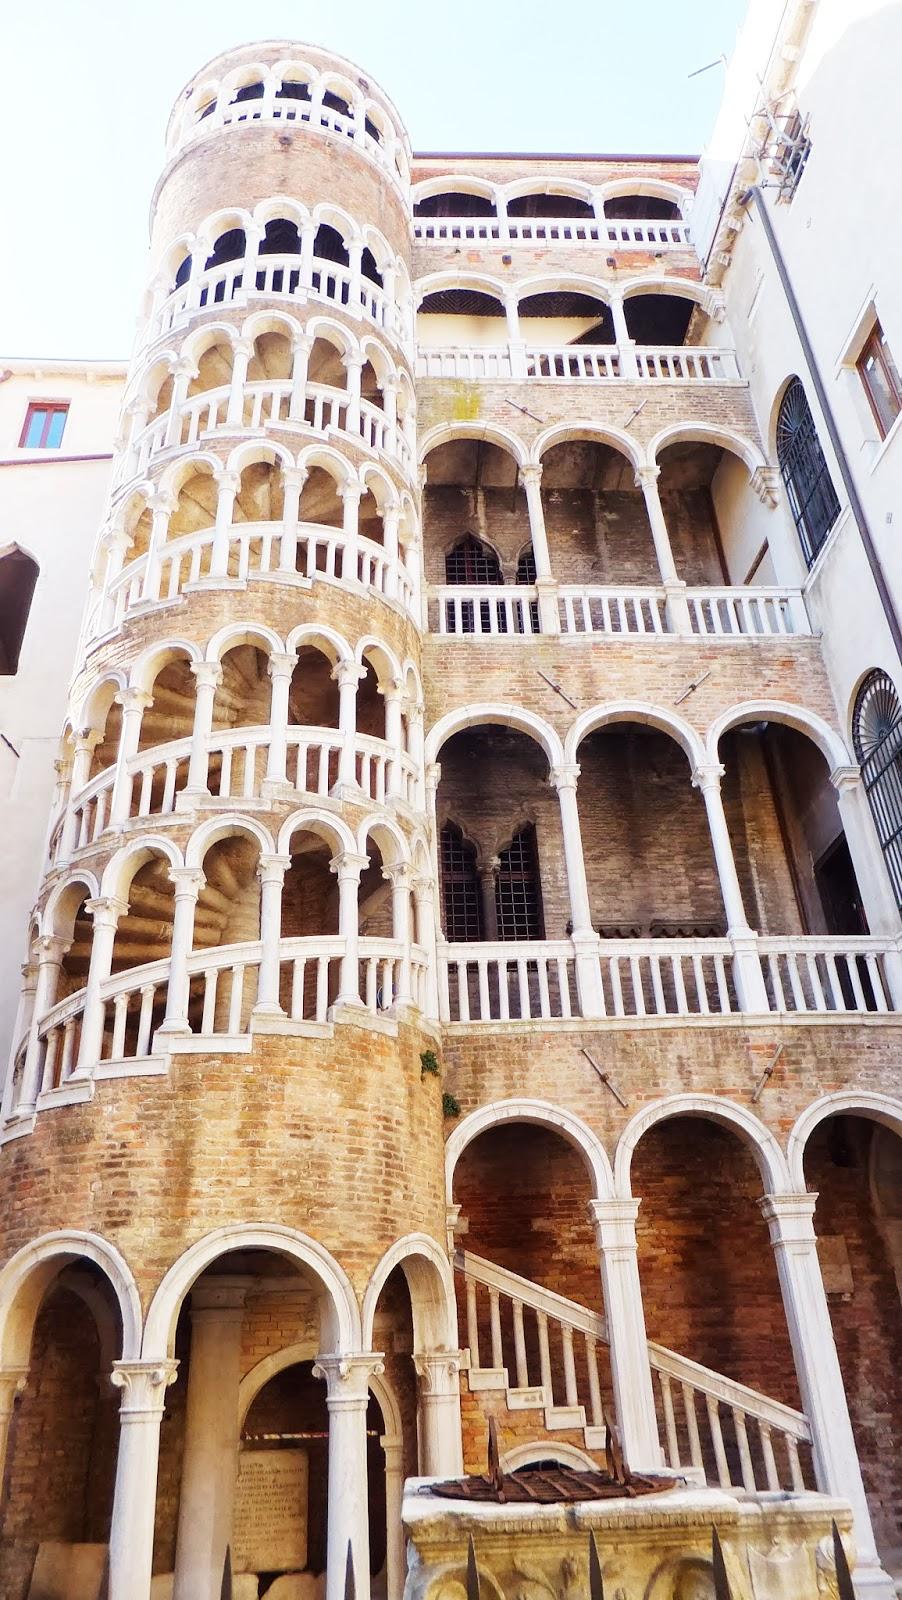 Scala Contarini dei Bolvolo, Canalazzo, Venecia, Venezia, Italia, Elisa N, Blog de Viajes, Lifestyle, Travel